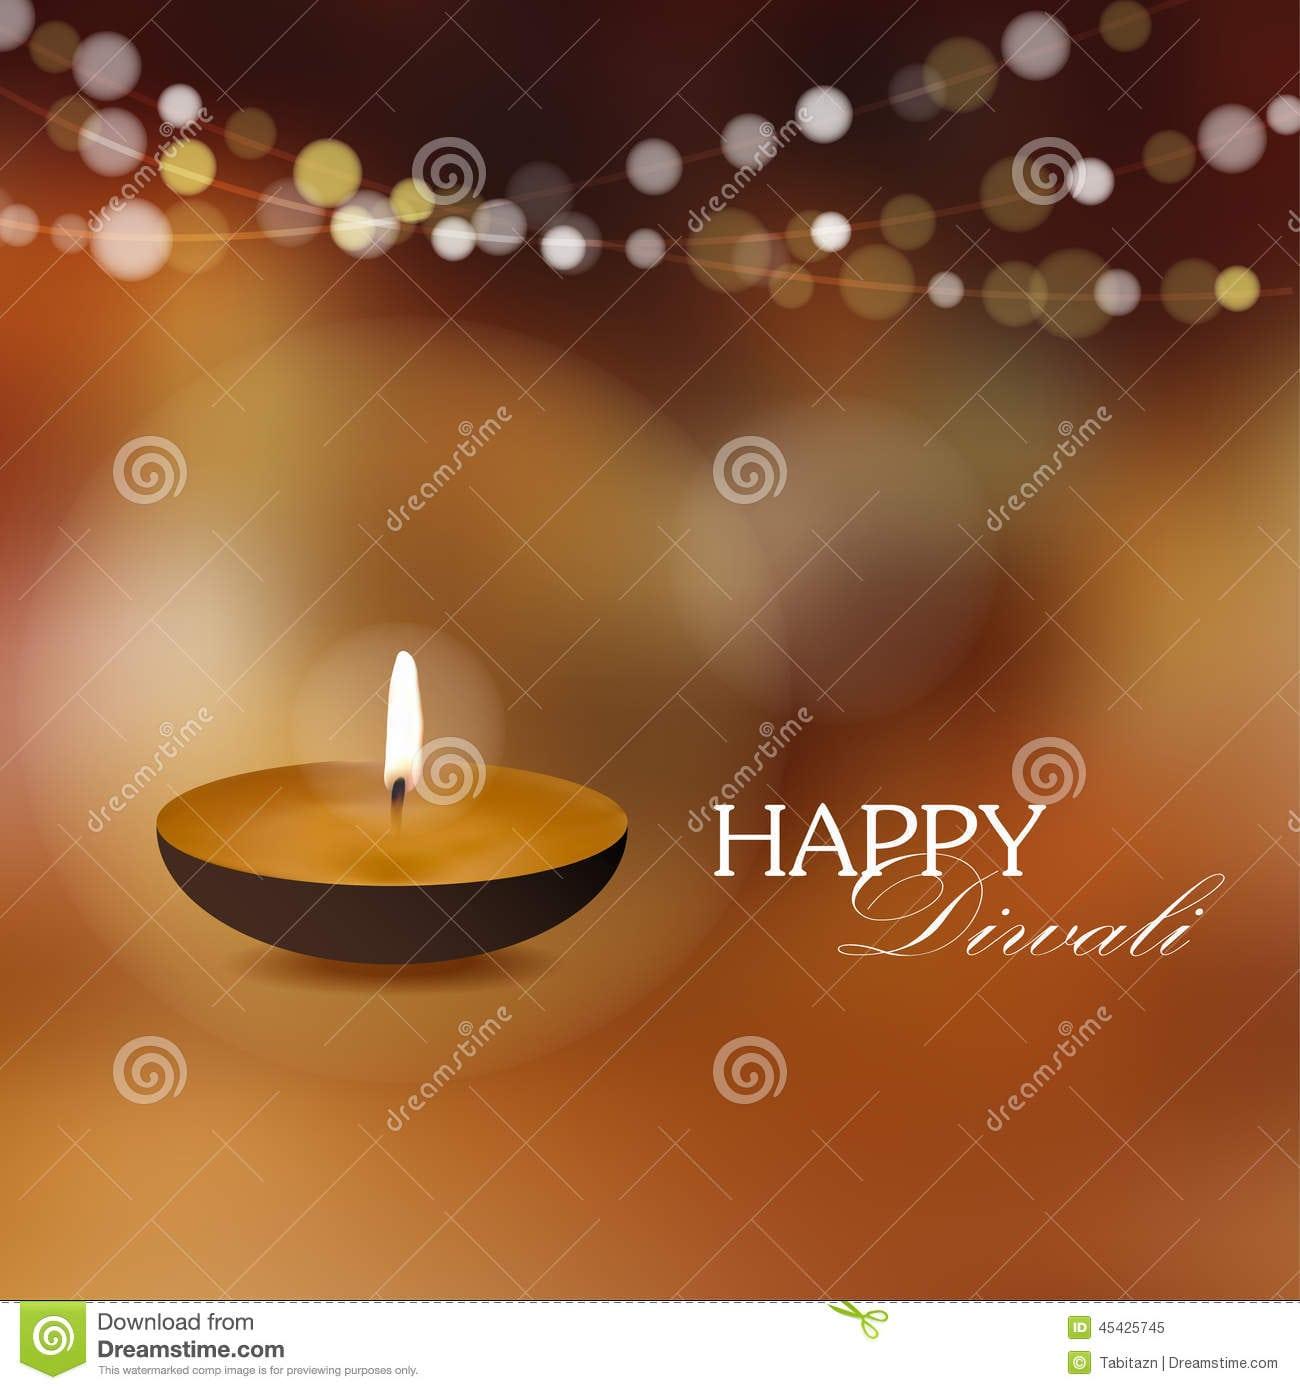 Diwali Greeting Card Invitation With Diya Oil Lamp, Stock Vector